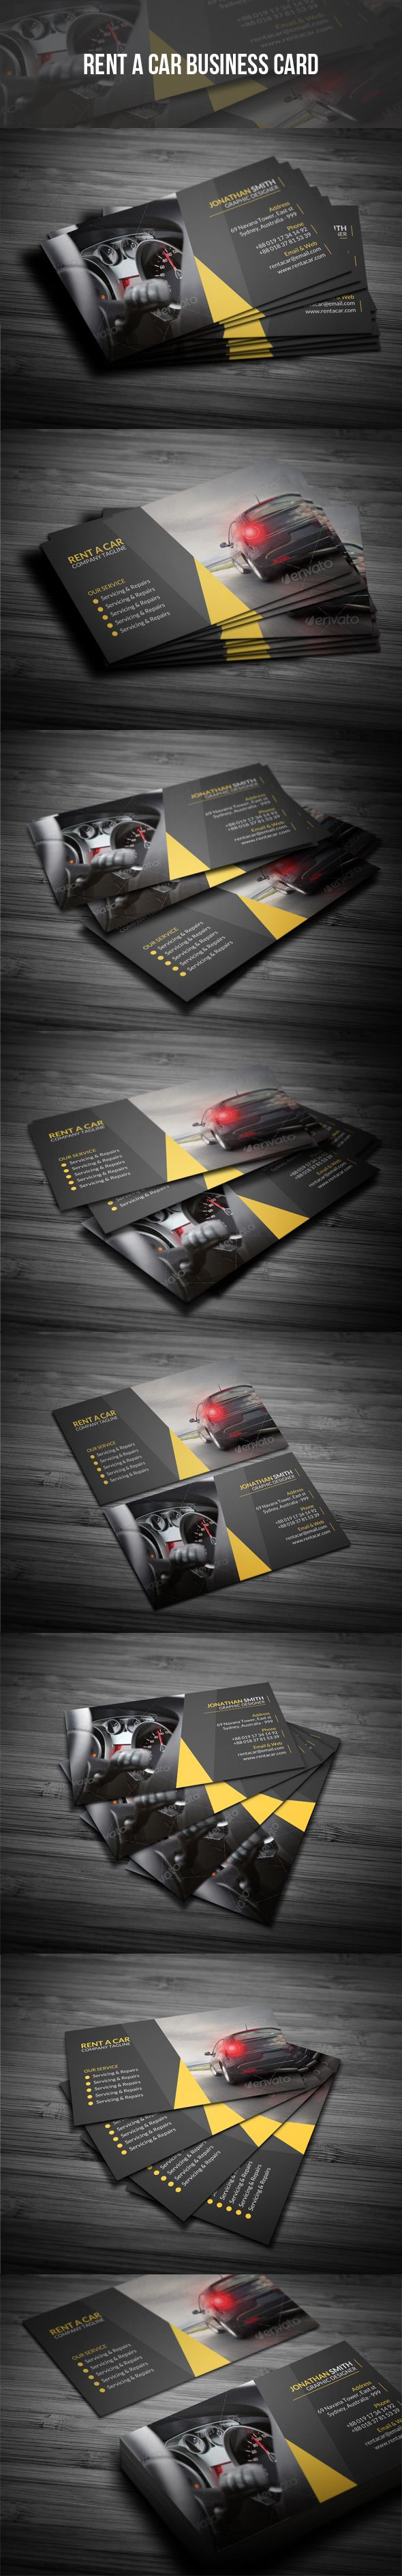 77 best business card designs images on pinterest